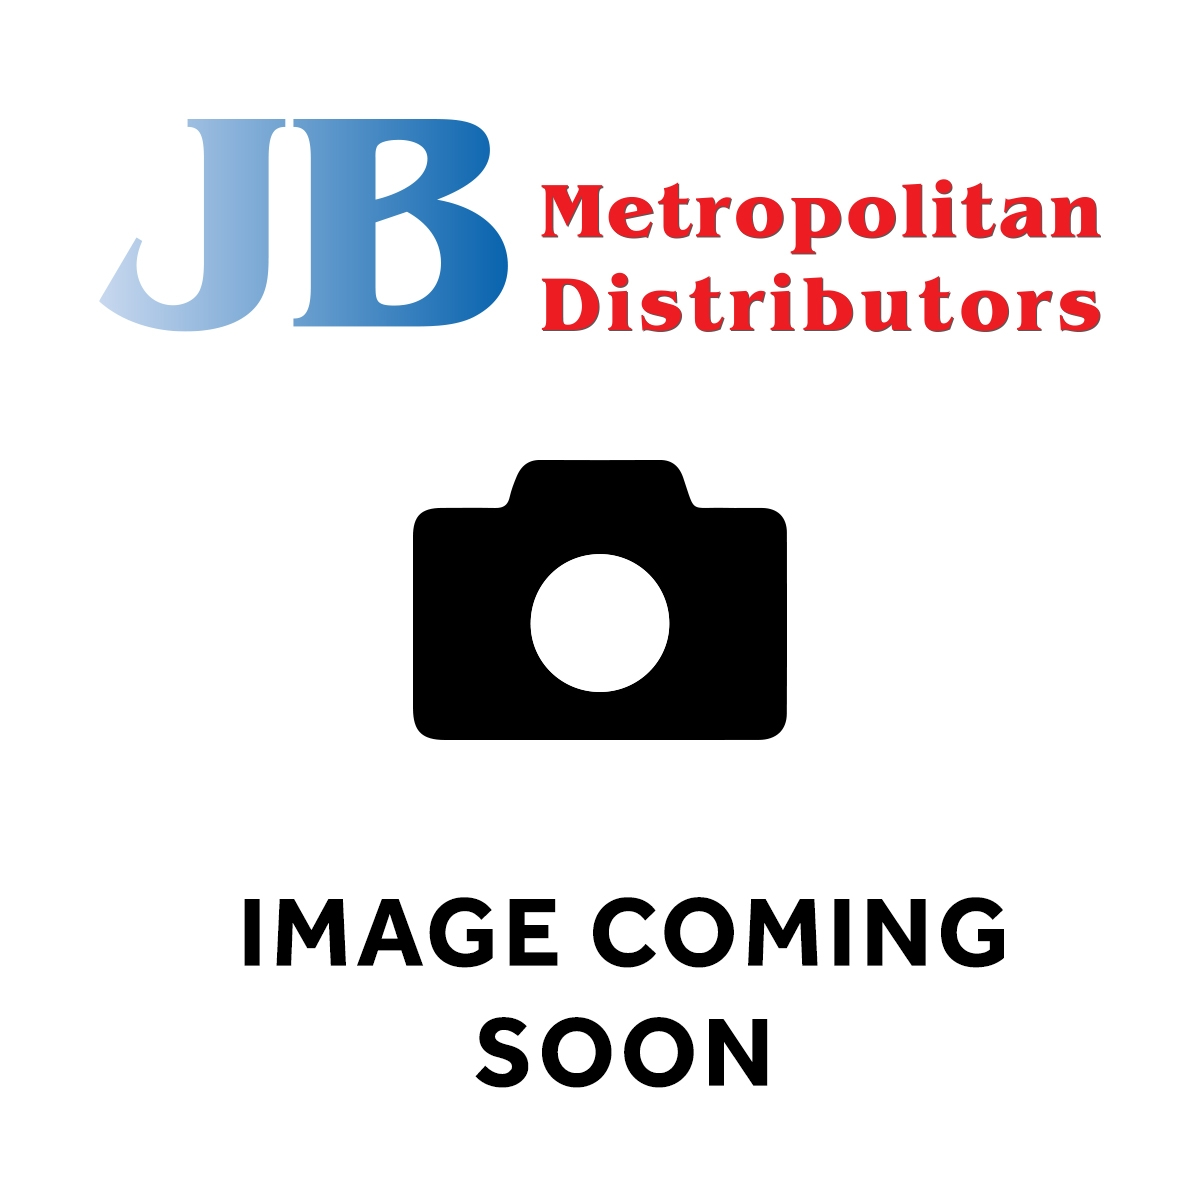 120G BALFOURS JAM BALL DONUTS